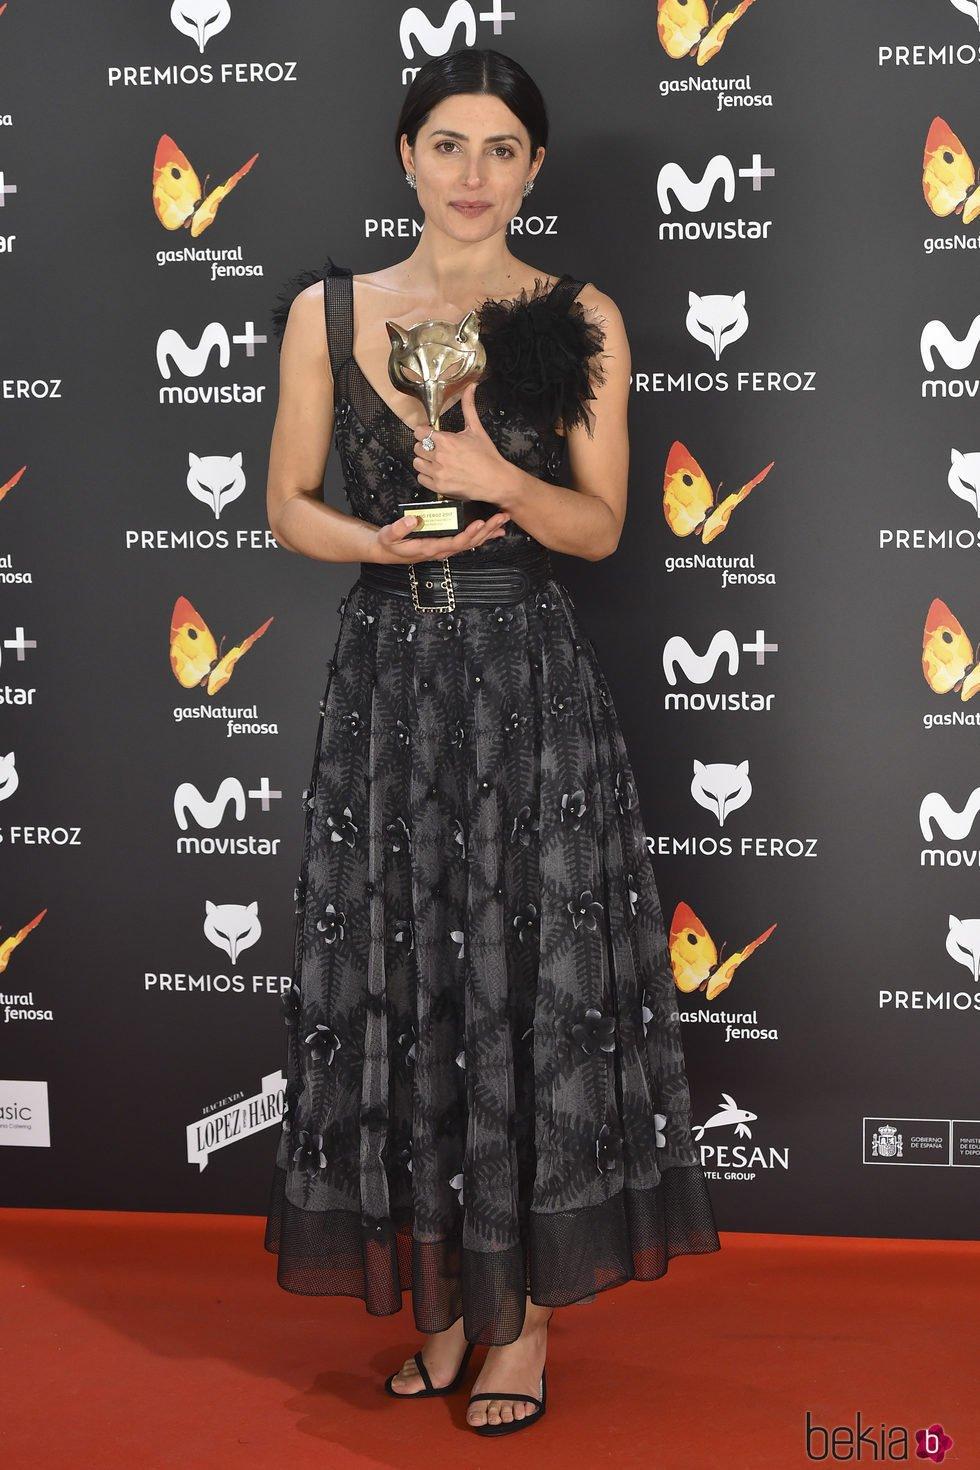 Bárbara Lennie con su Premio Feroz